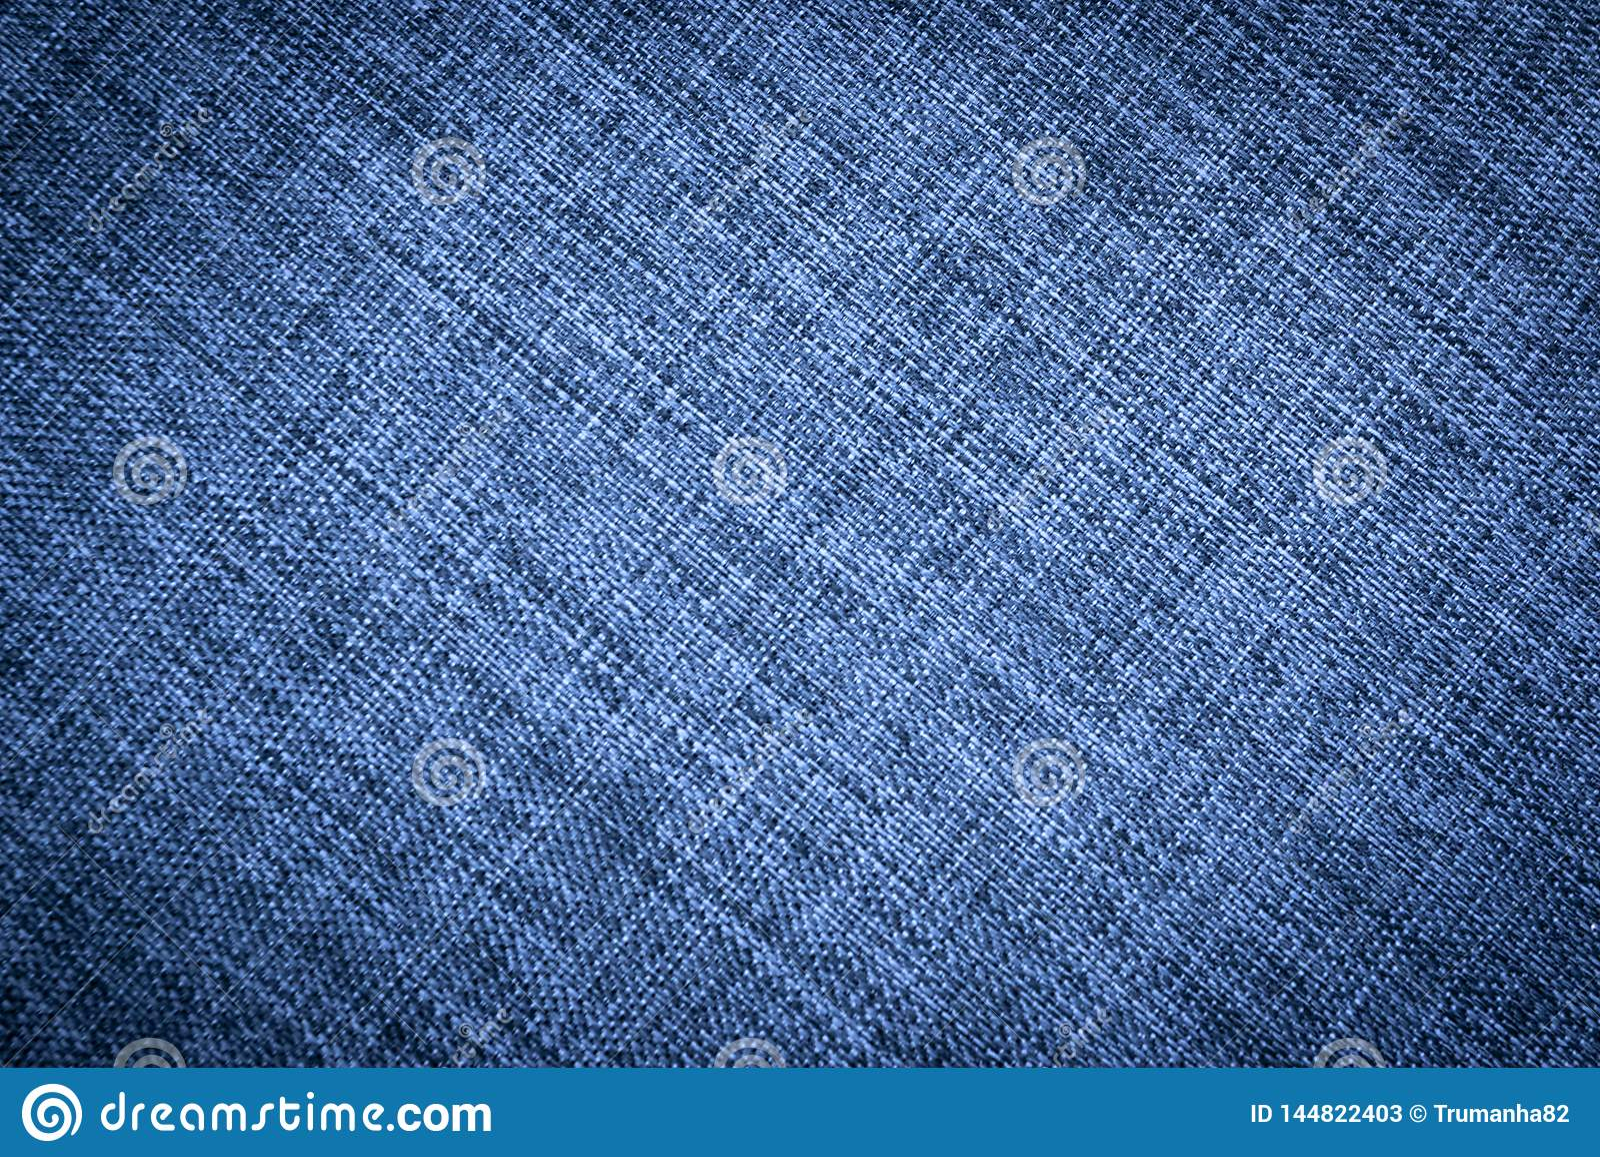 Texture of Dark Blue Canvas Fabric